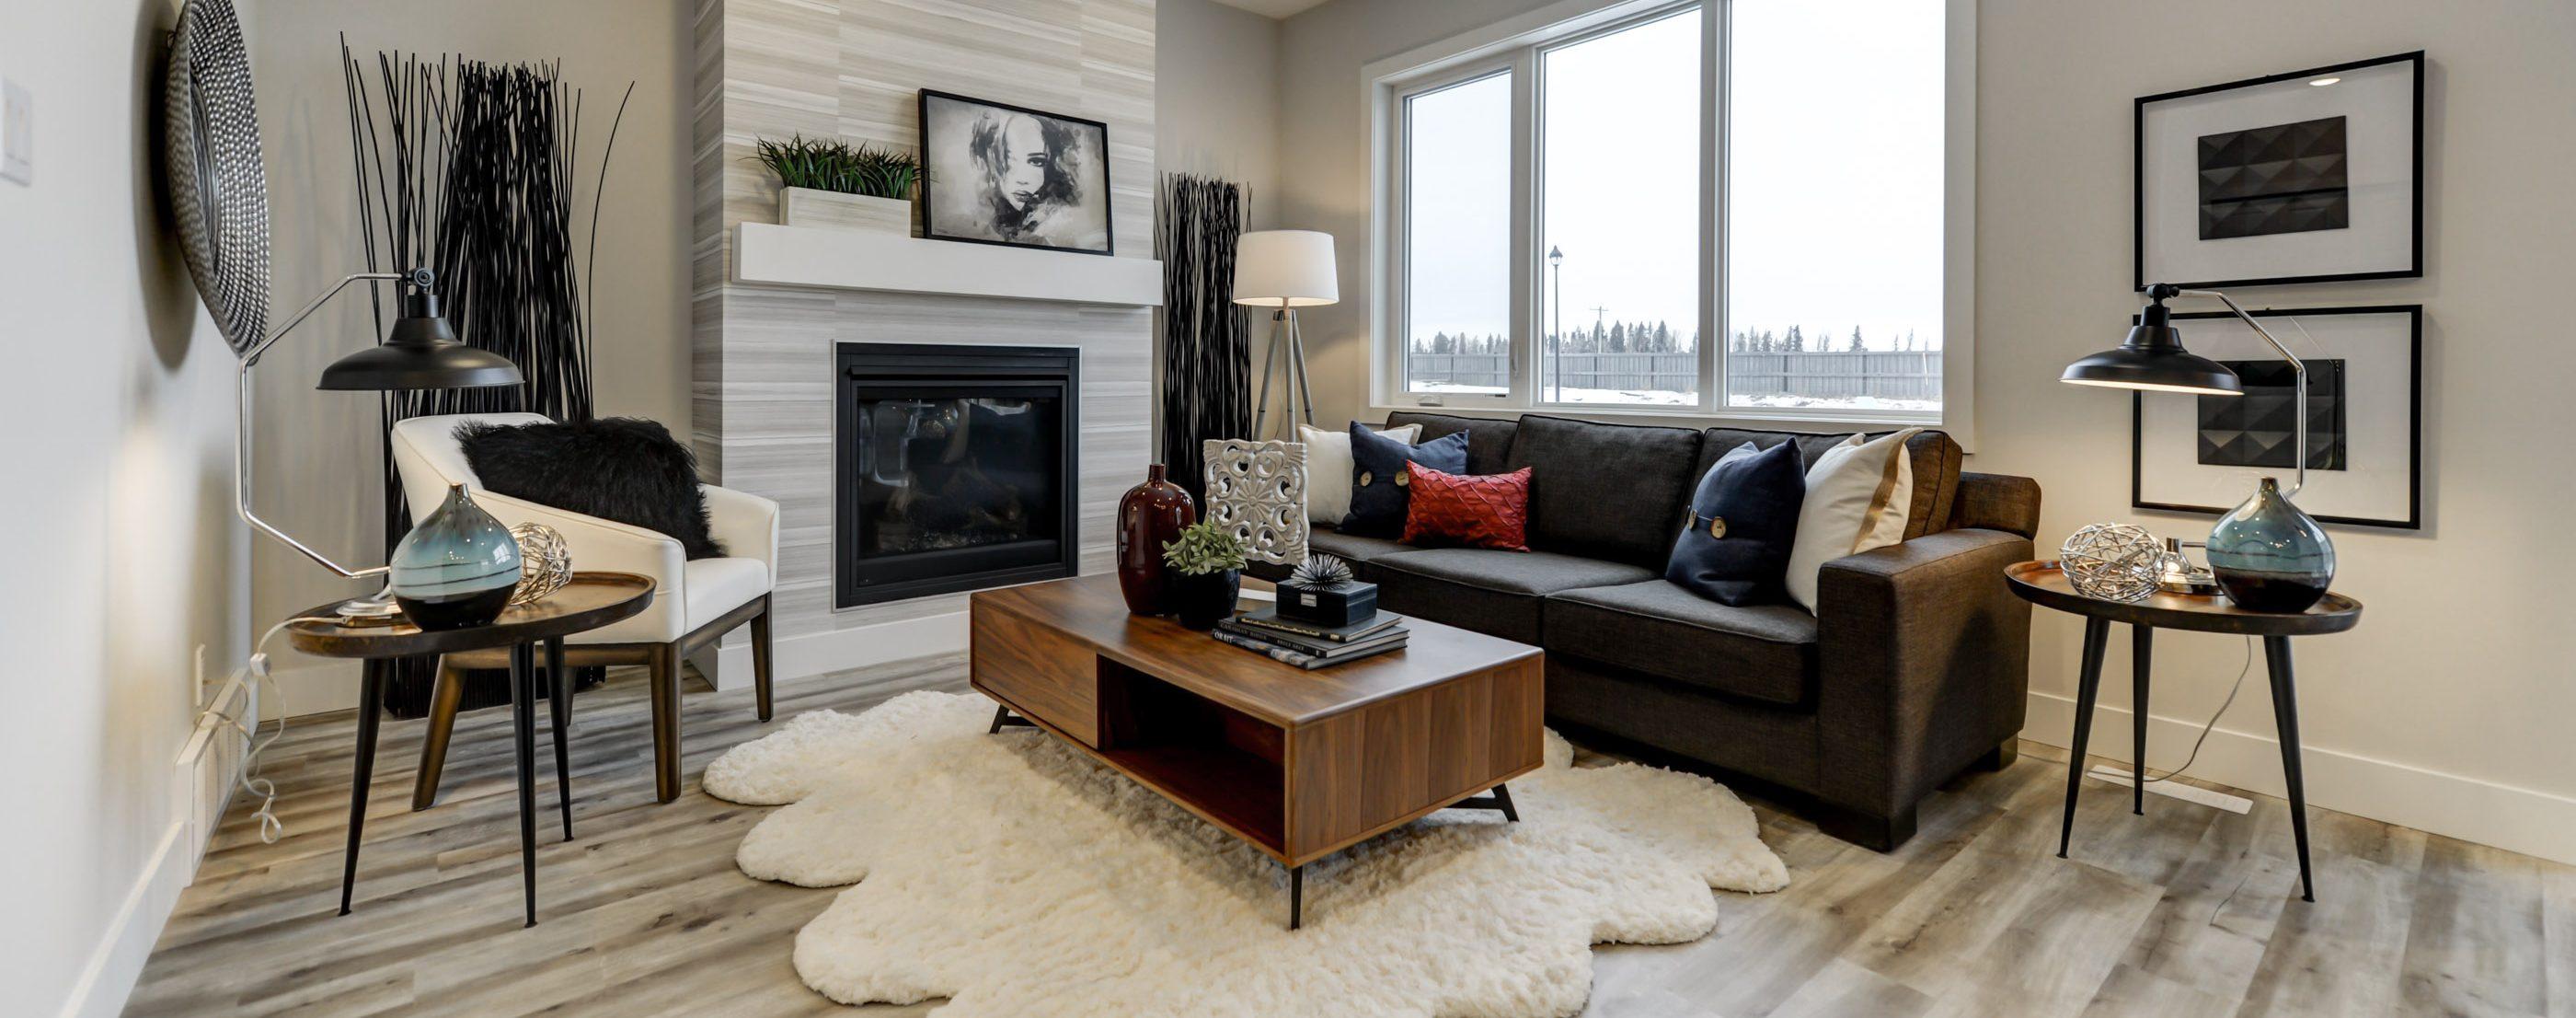 Edmonton Home Staging Company 7804524527 Sherwood Park St